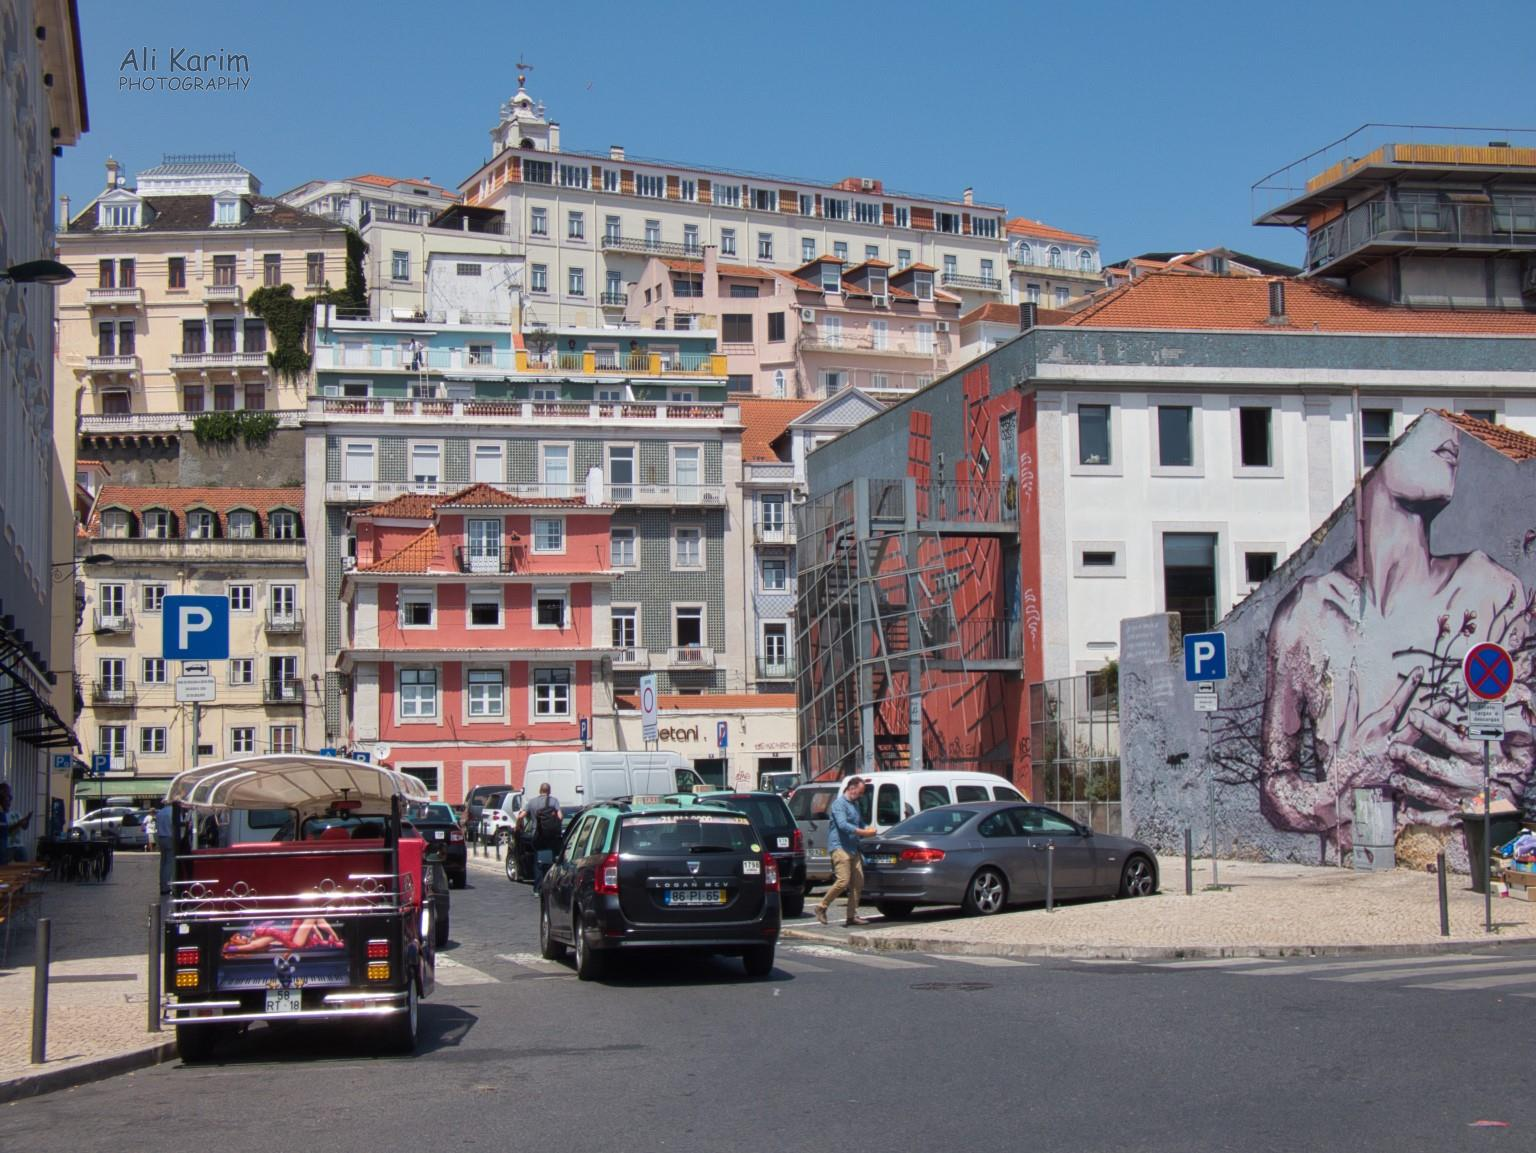 Lisbon and daily life